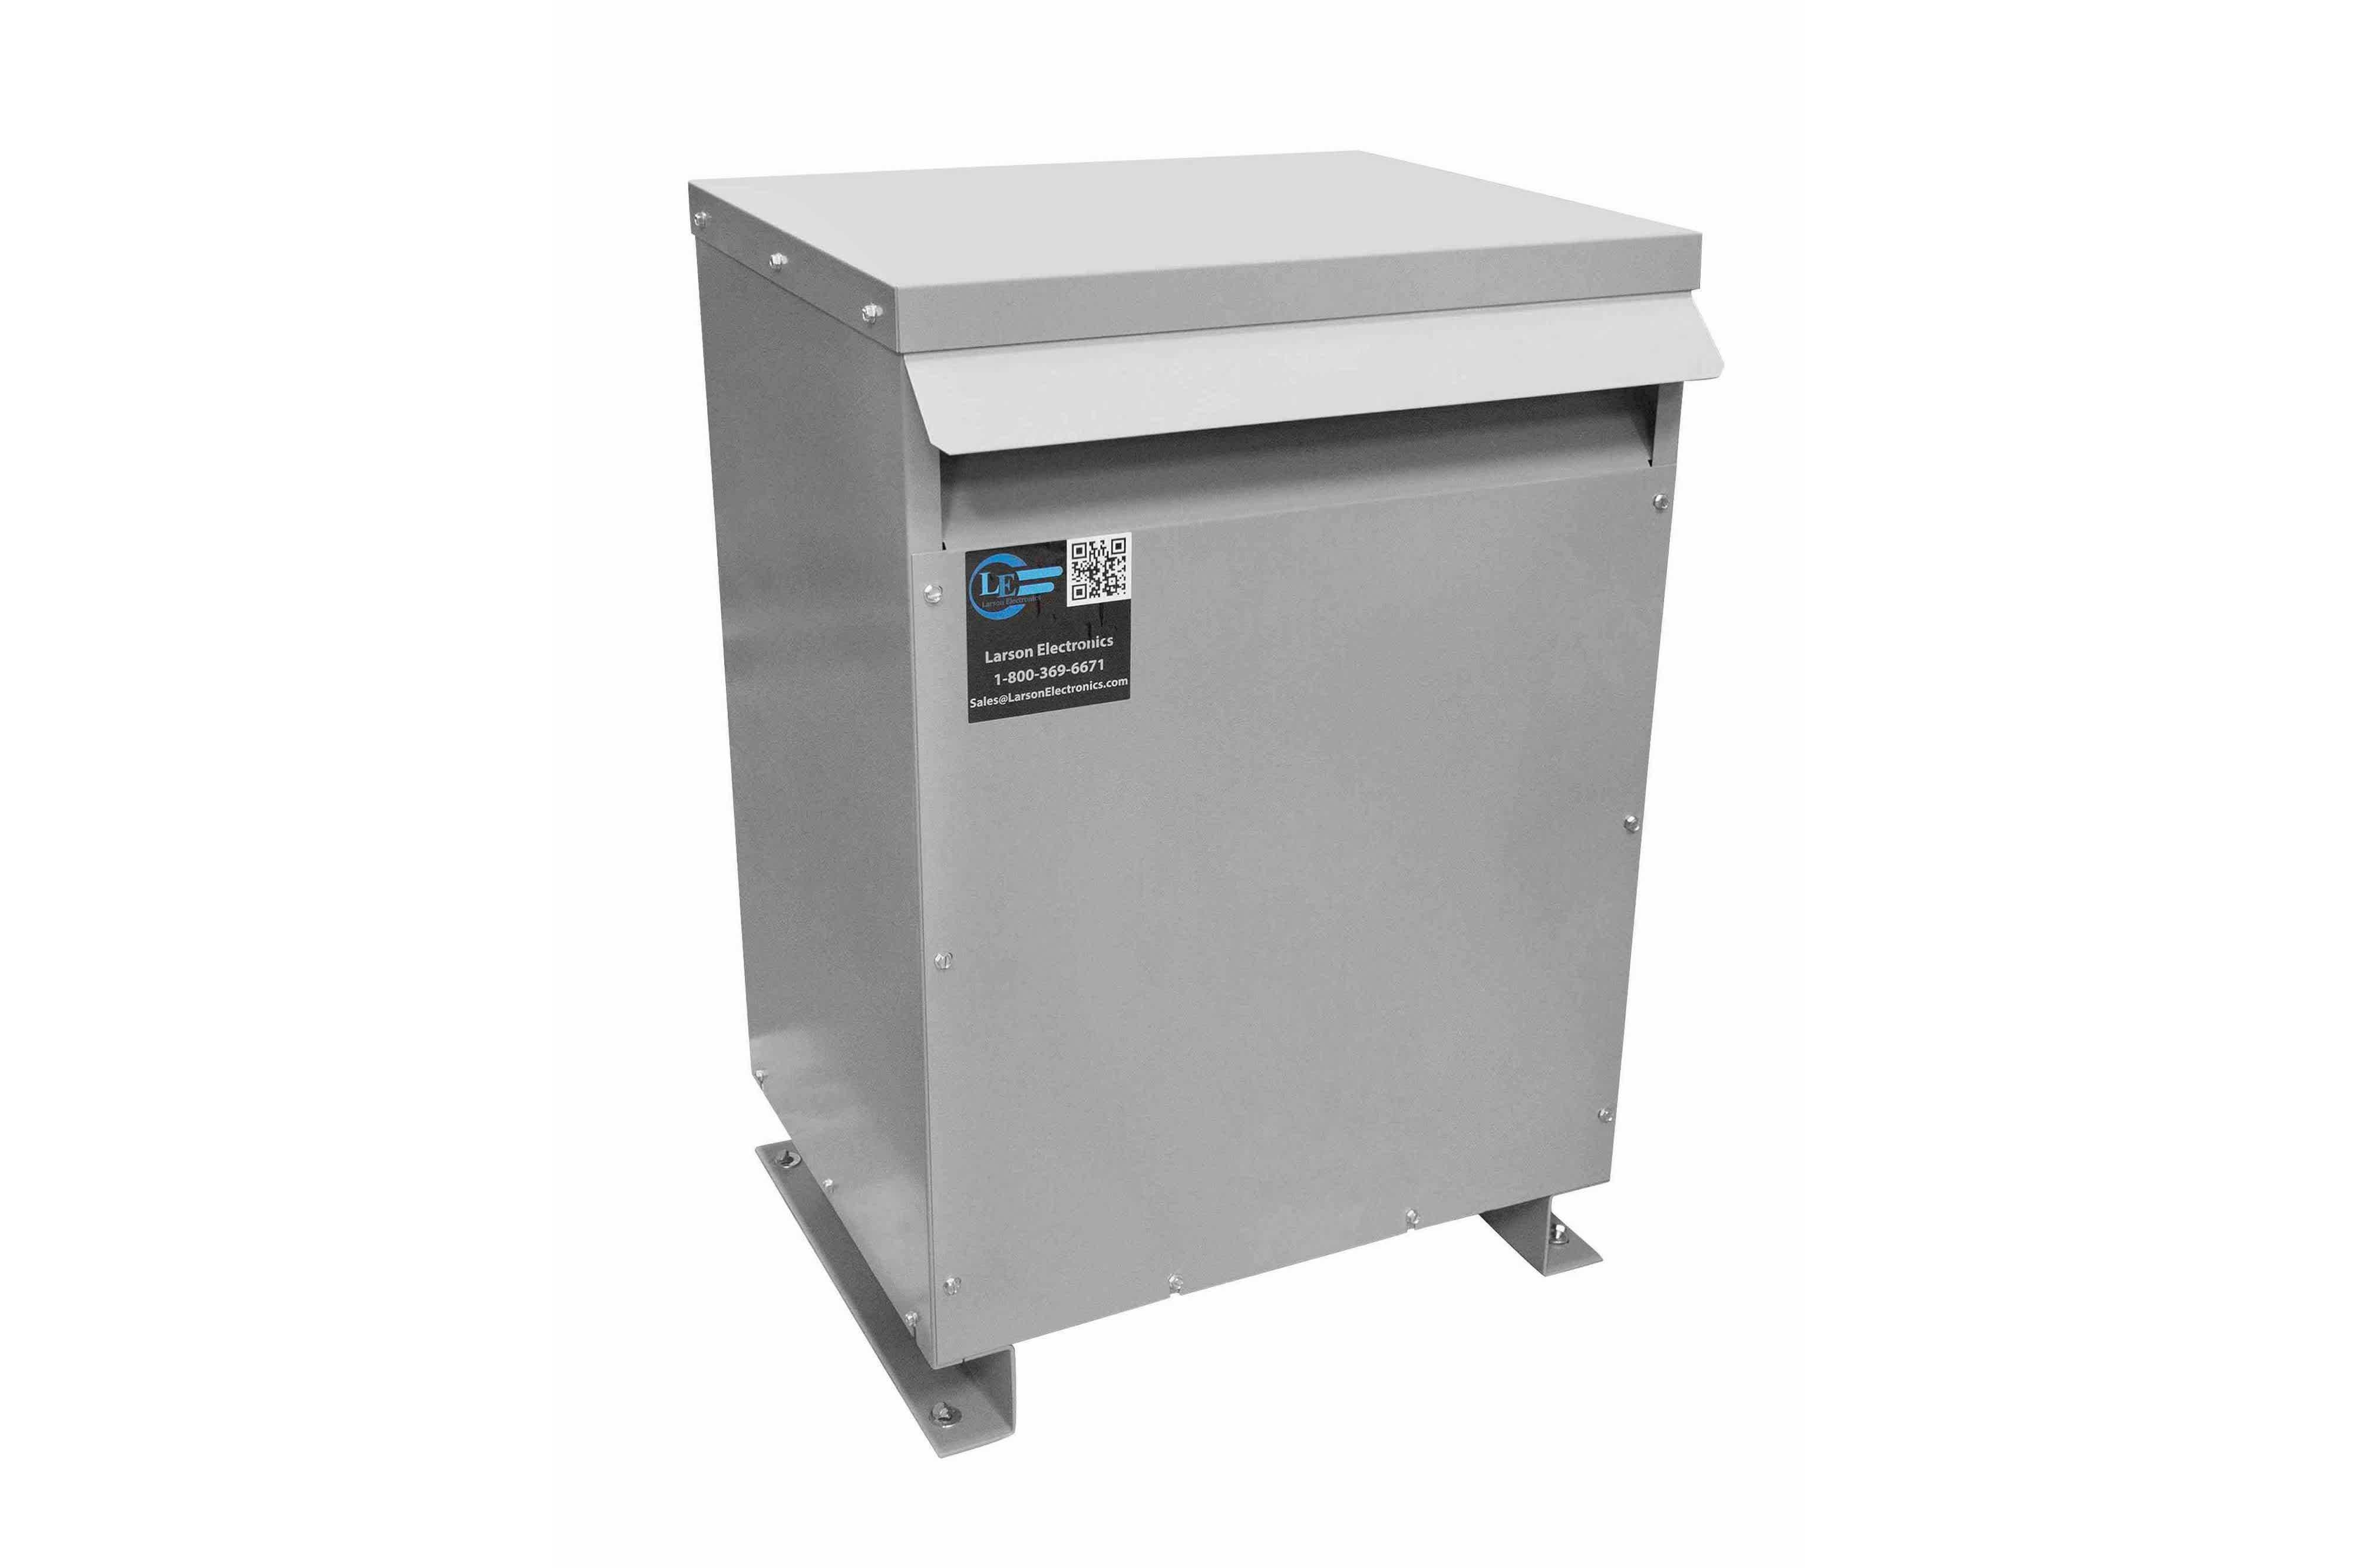 90 kVA 3PH Isolation Transformer, 480V Wye Primary, 208V Delta Secondary, N3R, Ventilated, 60 Hz